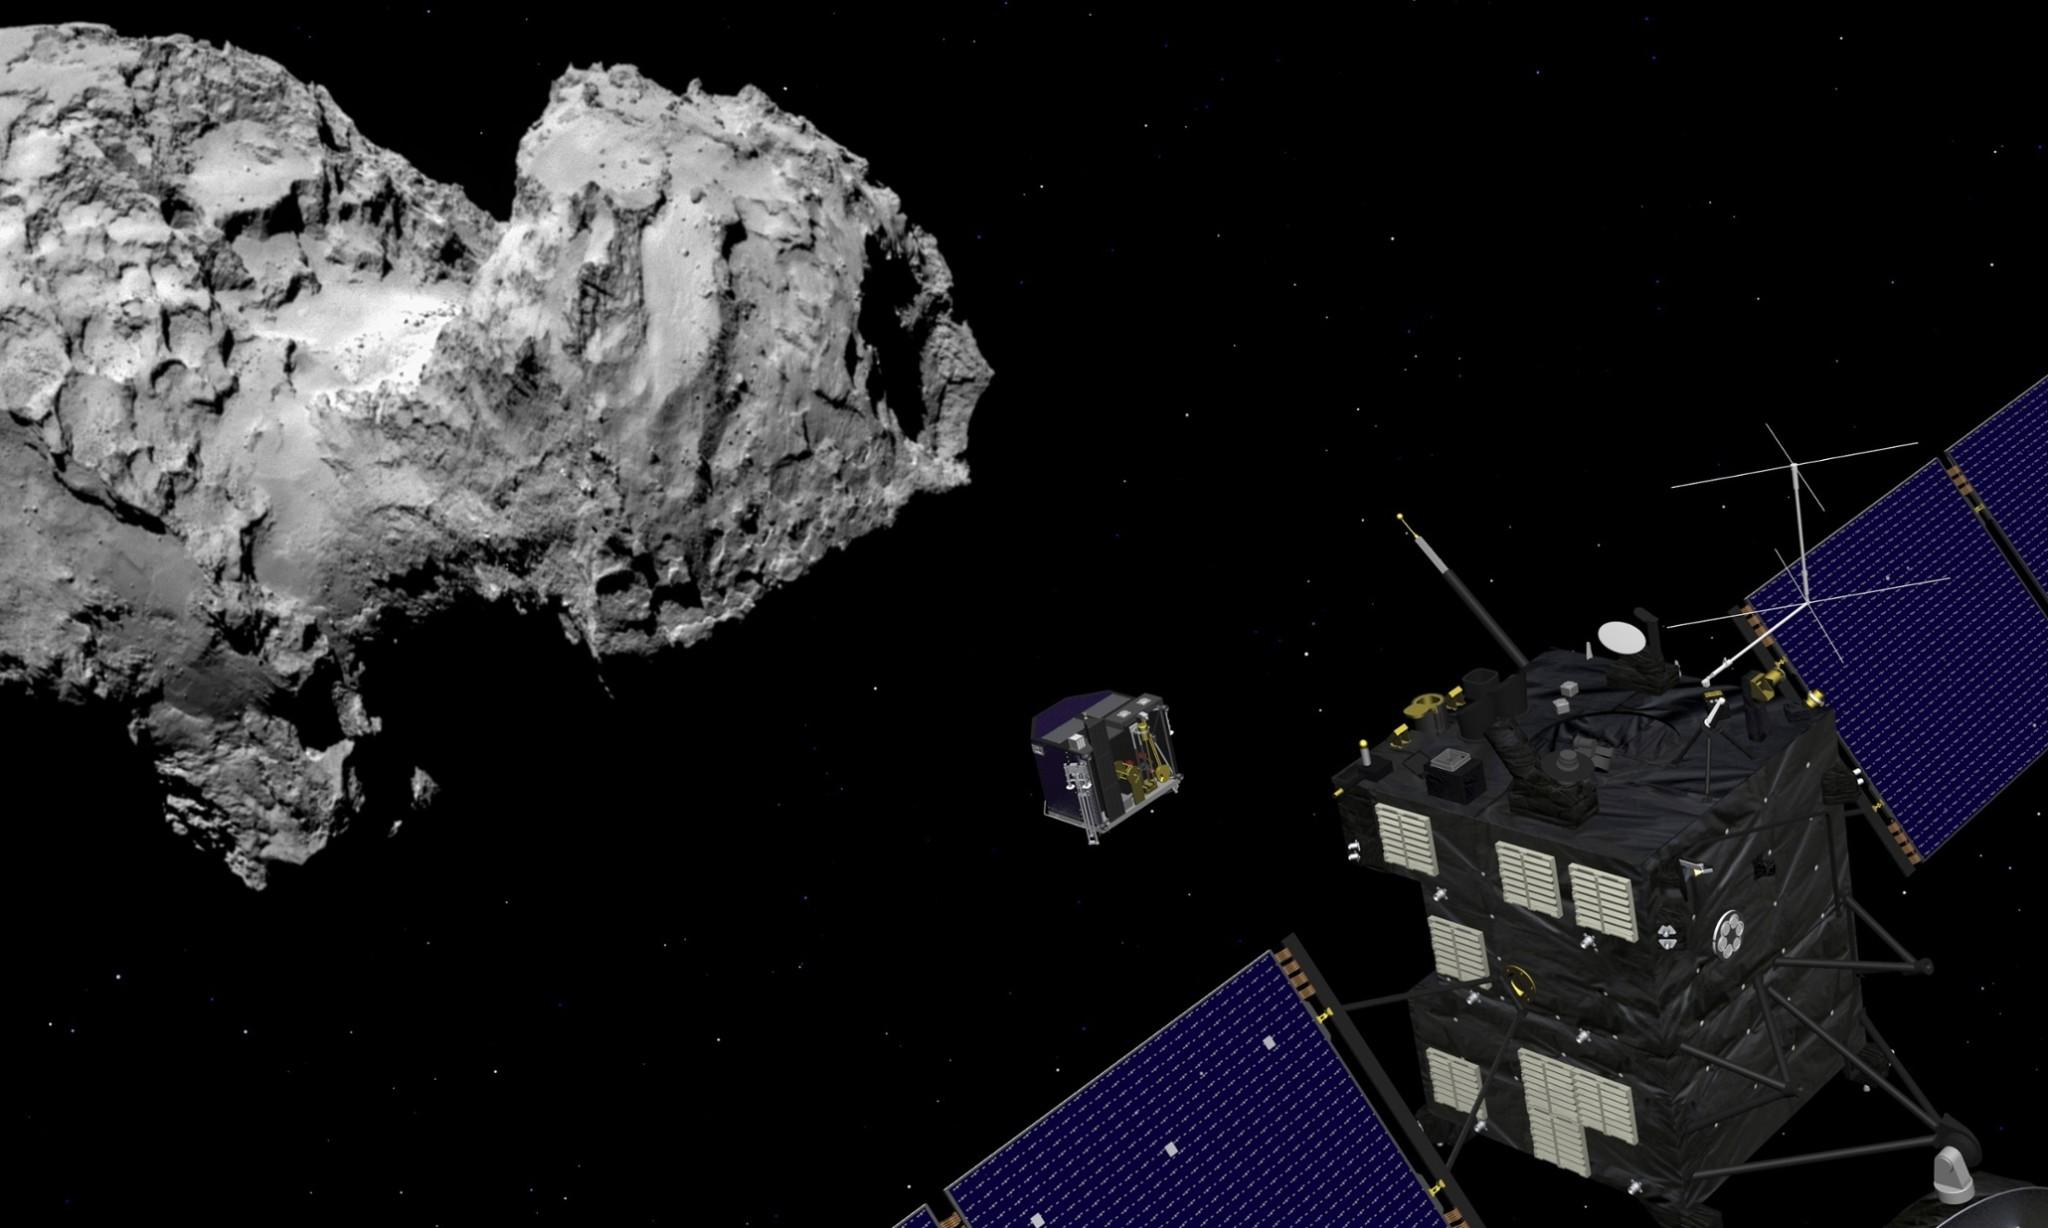 Rosetta comet landing on course despite wake-up glitch